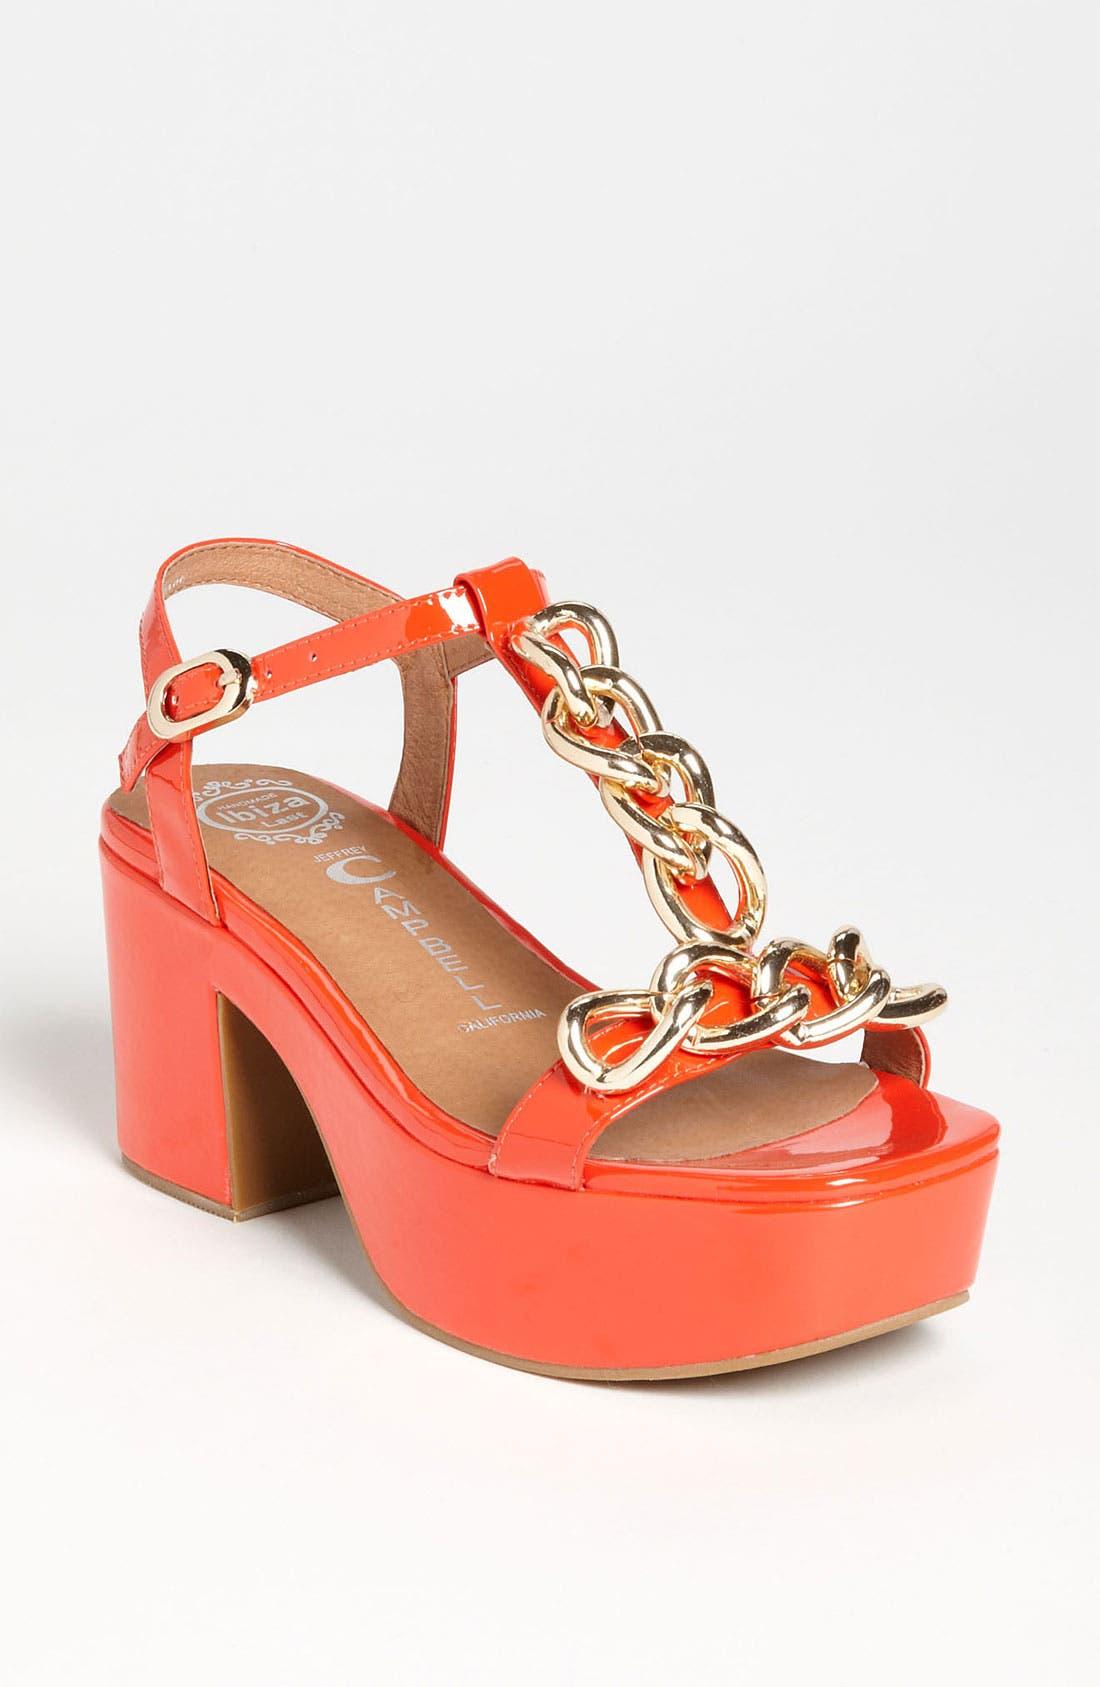 Main Image - Jeffrey Campbell 'Yasmine' Sandal